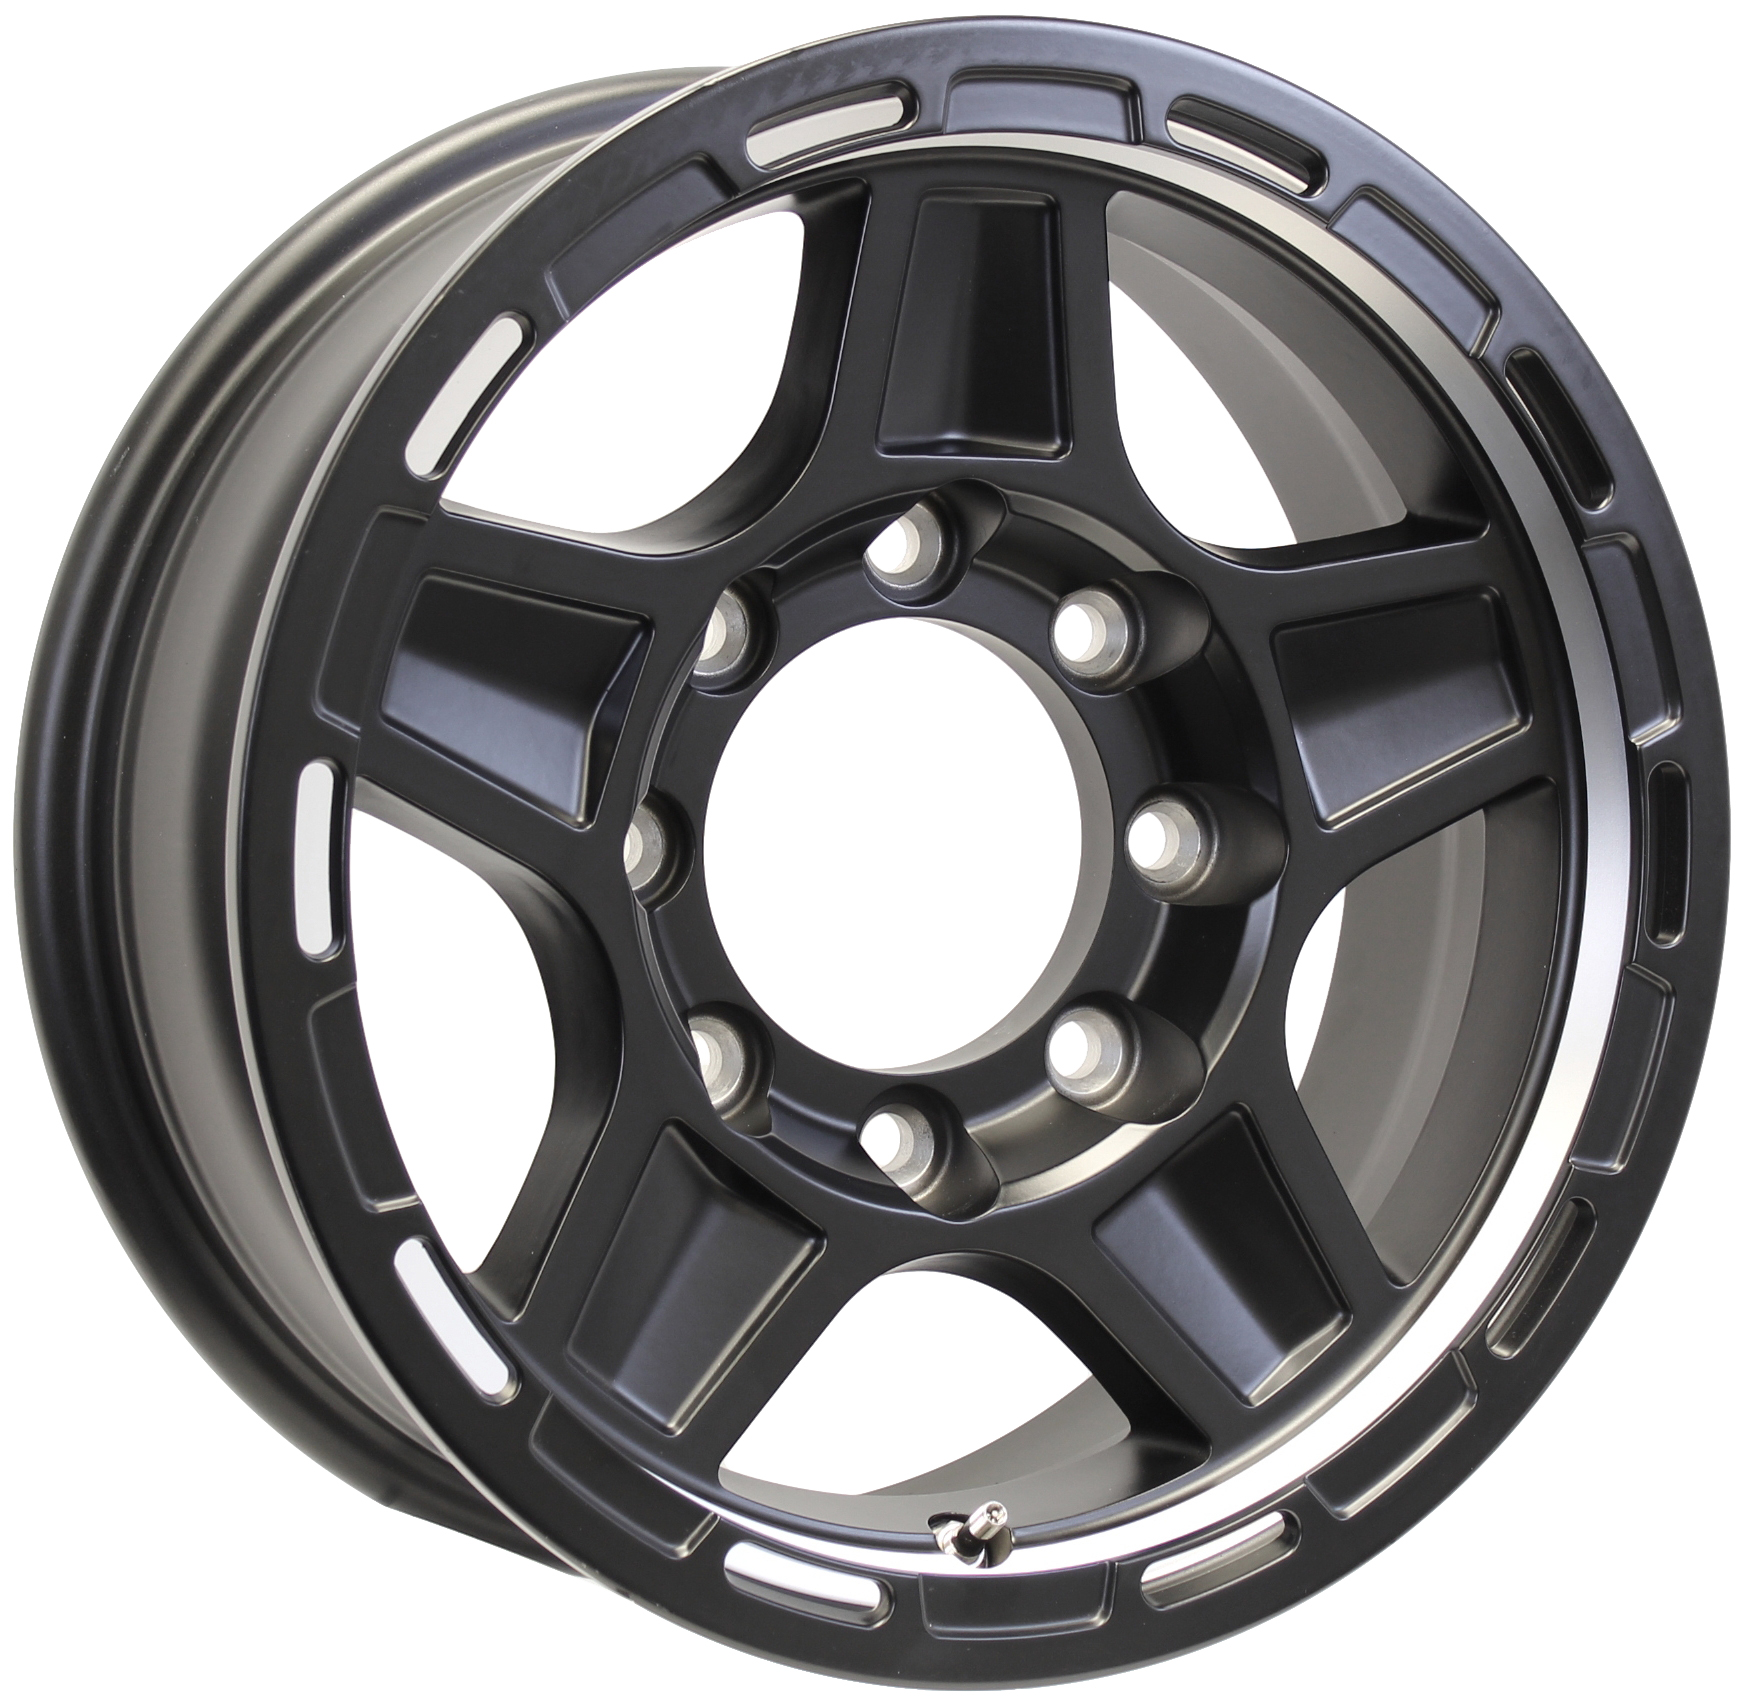 Hercules 16x7; 8-Lug Matte Black Aluminum Trailer Wheel Image